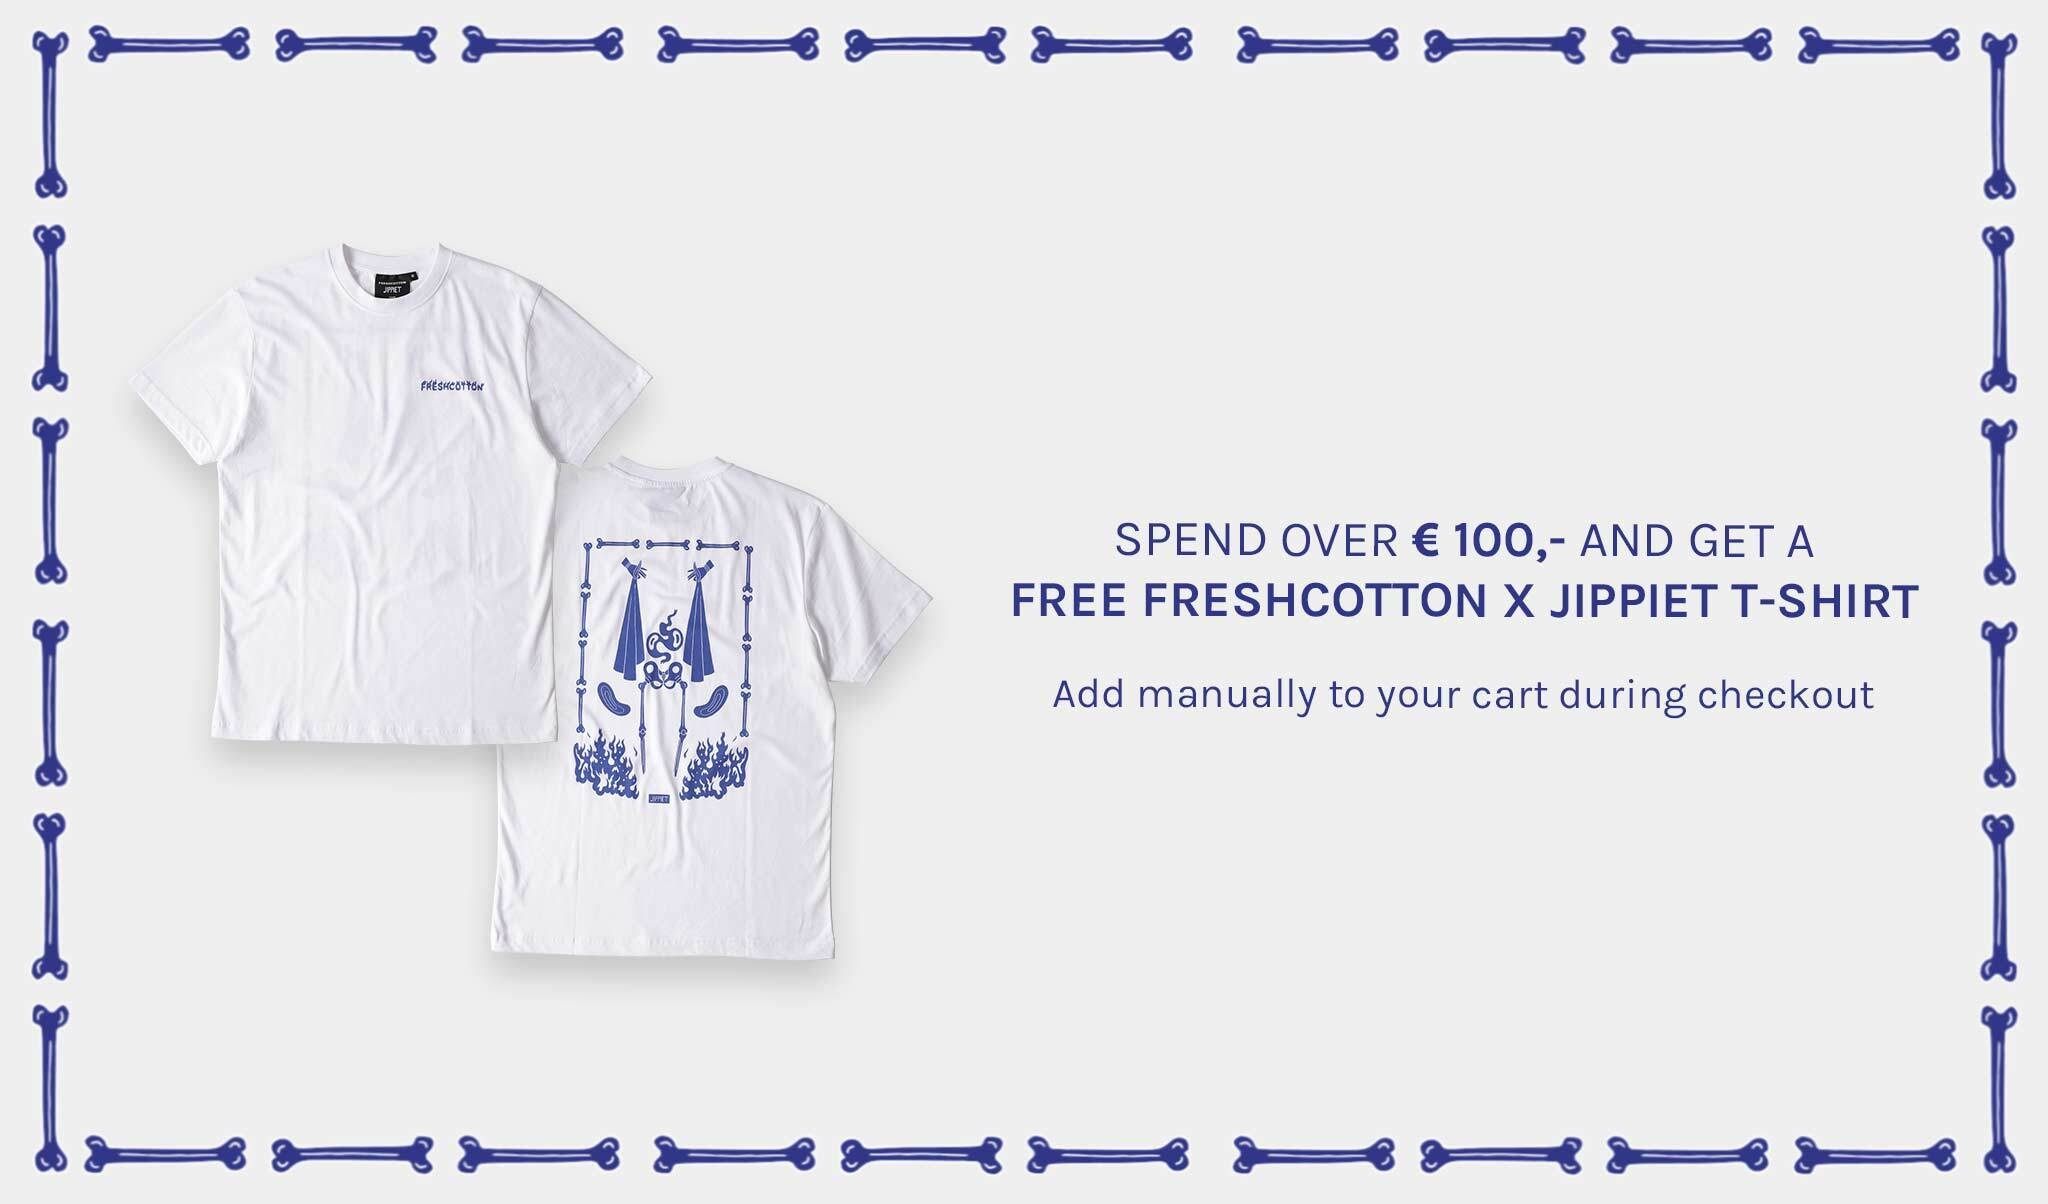 Free Freshcotton x Jippiet T-shirt